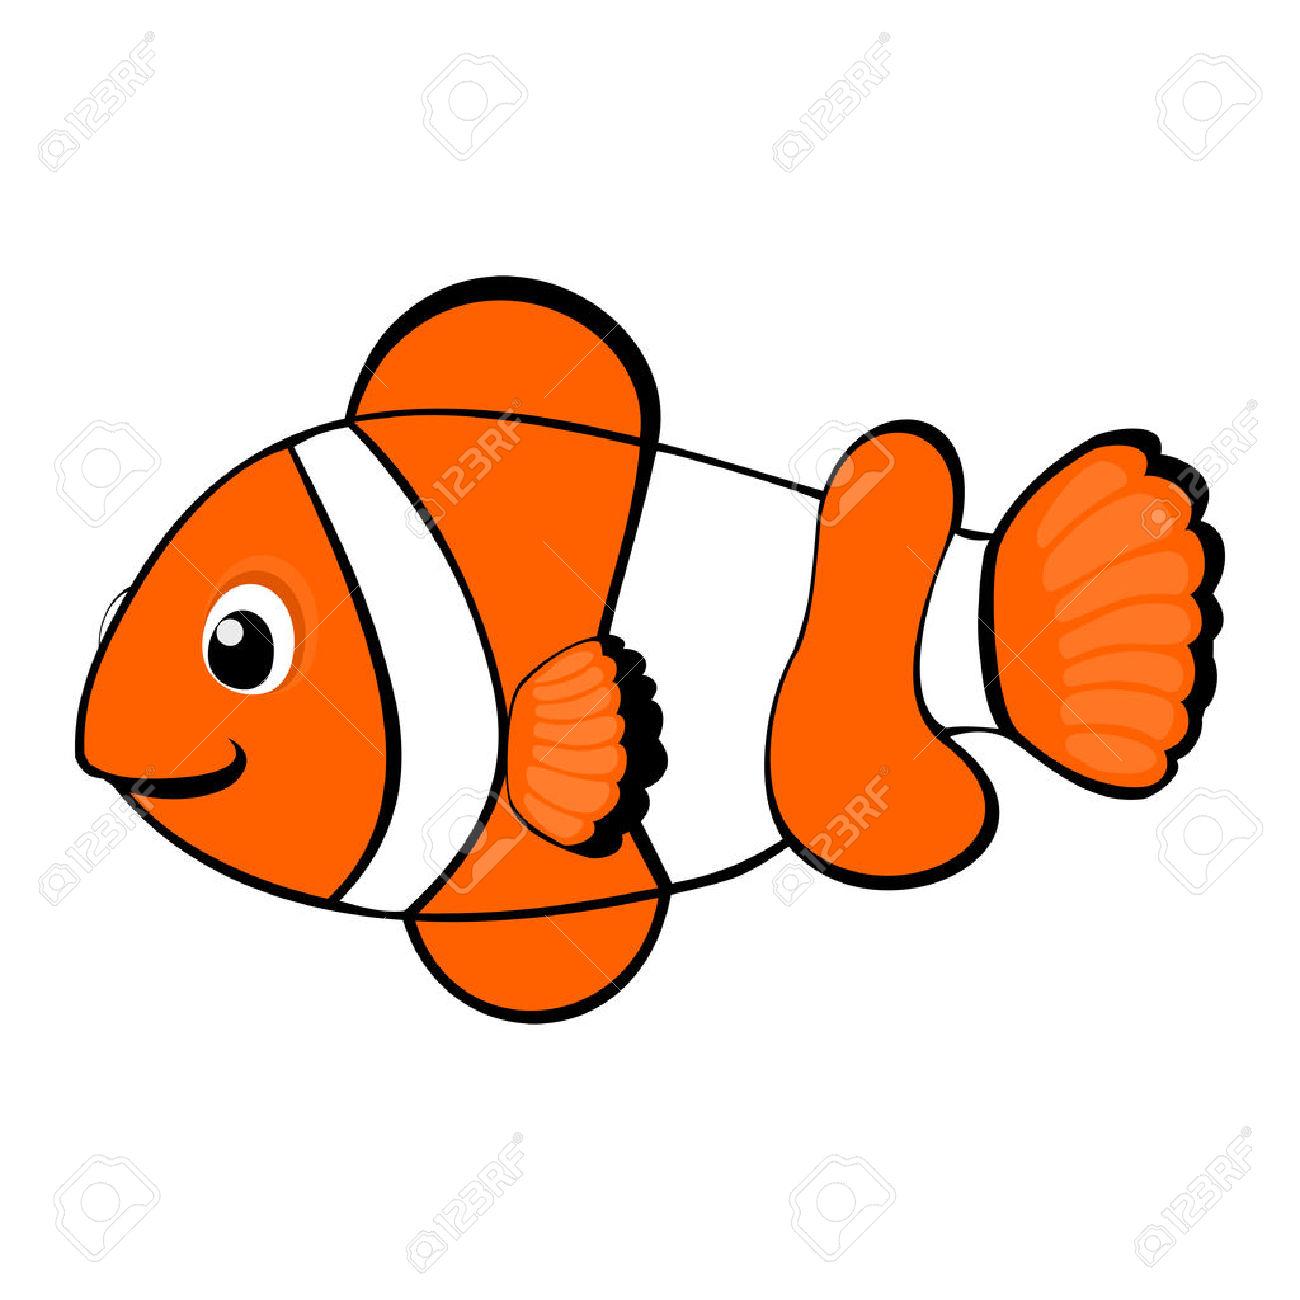 Clown Fish Cartoon Royalty Free Cliparts, Vectors, And Stock.